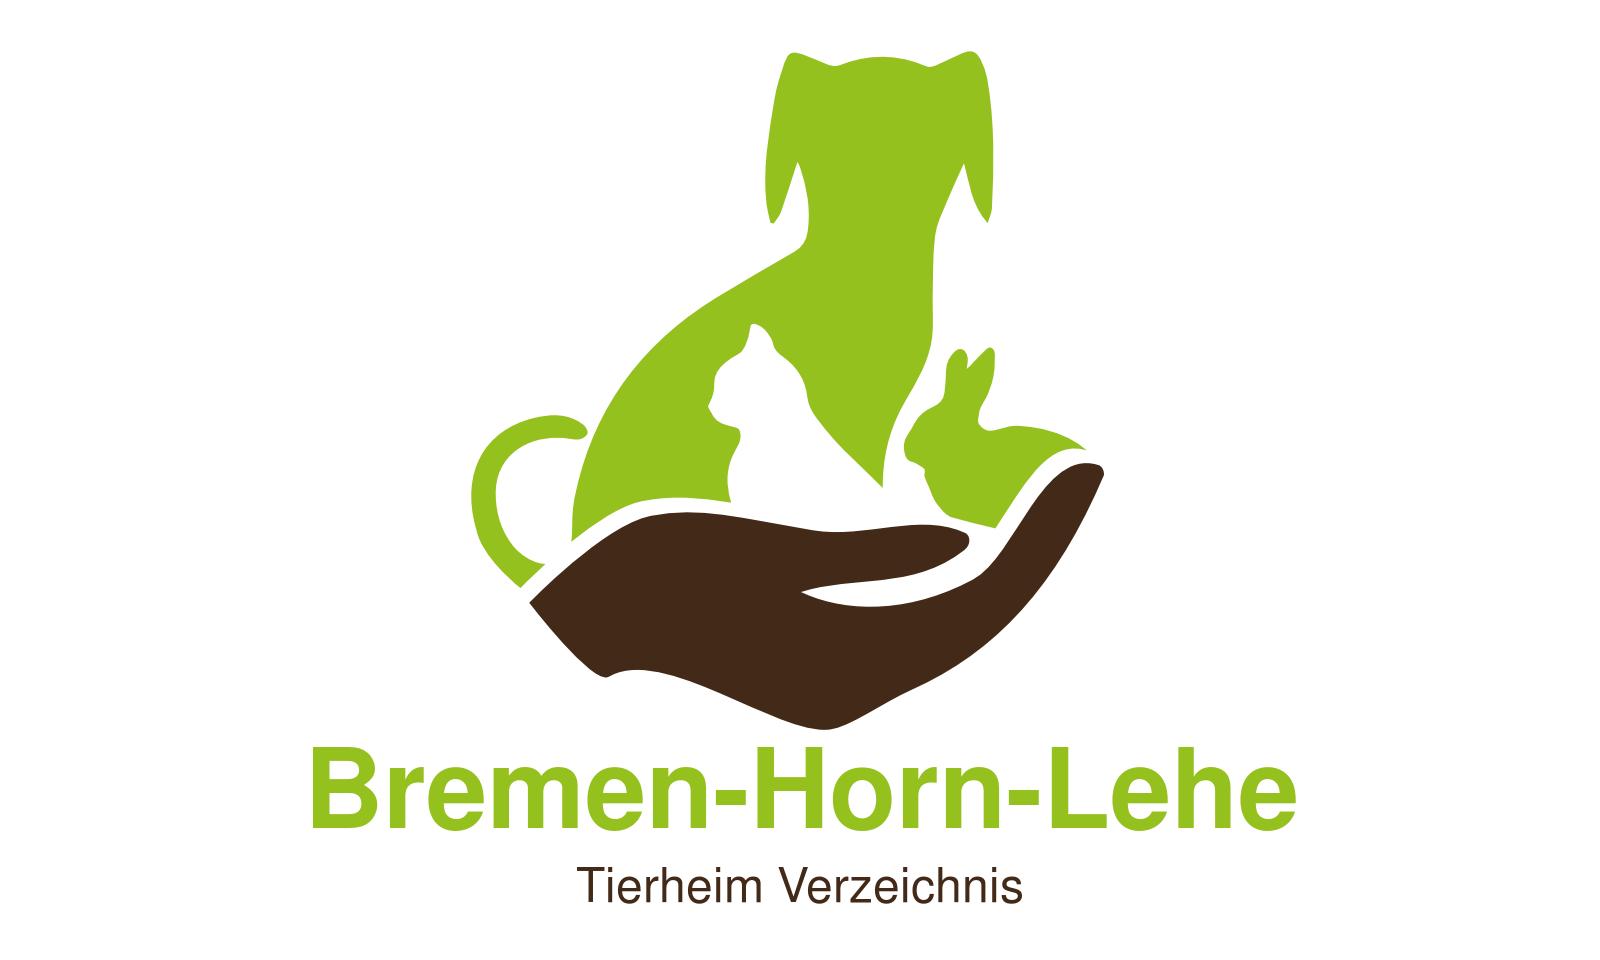 Tierheim Bremen Horn-Lehe